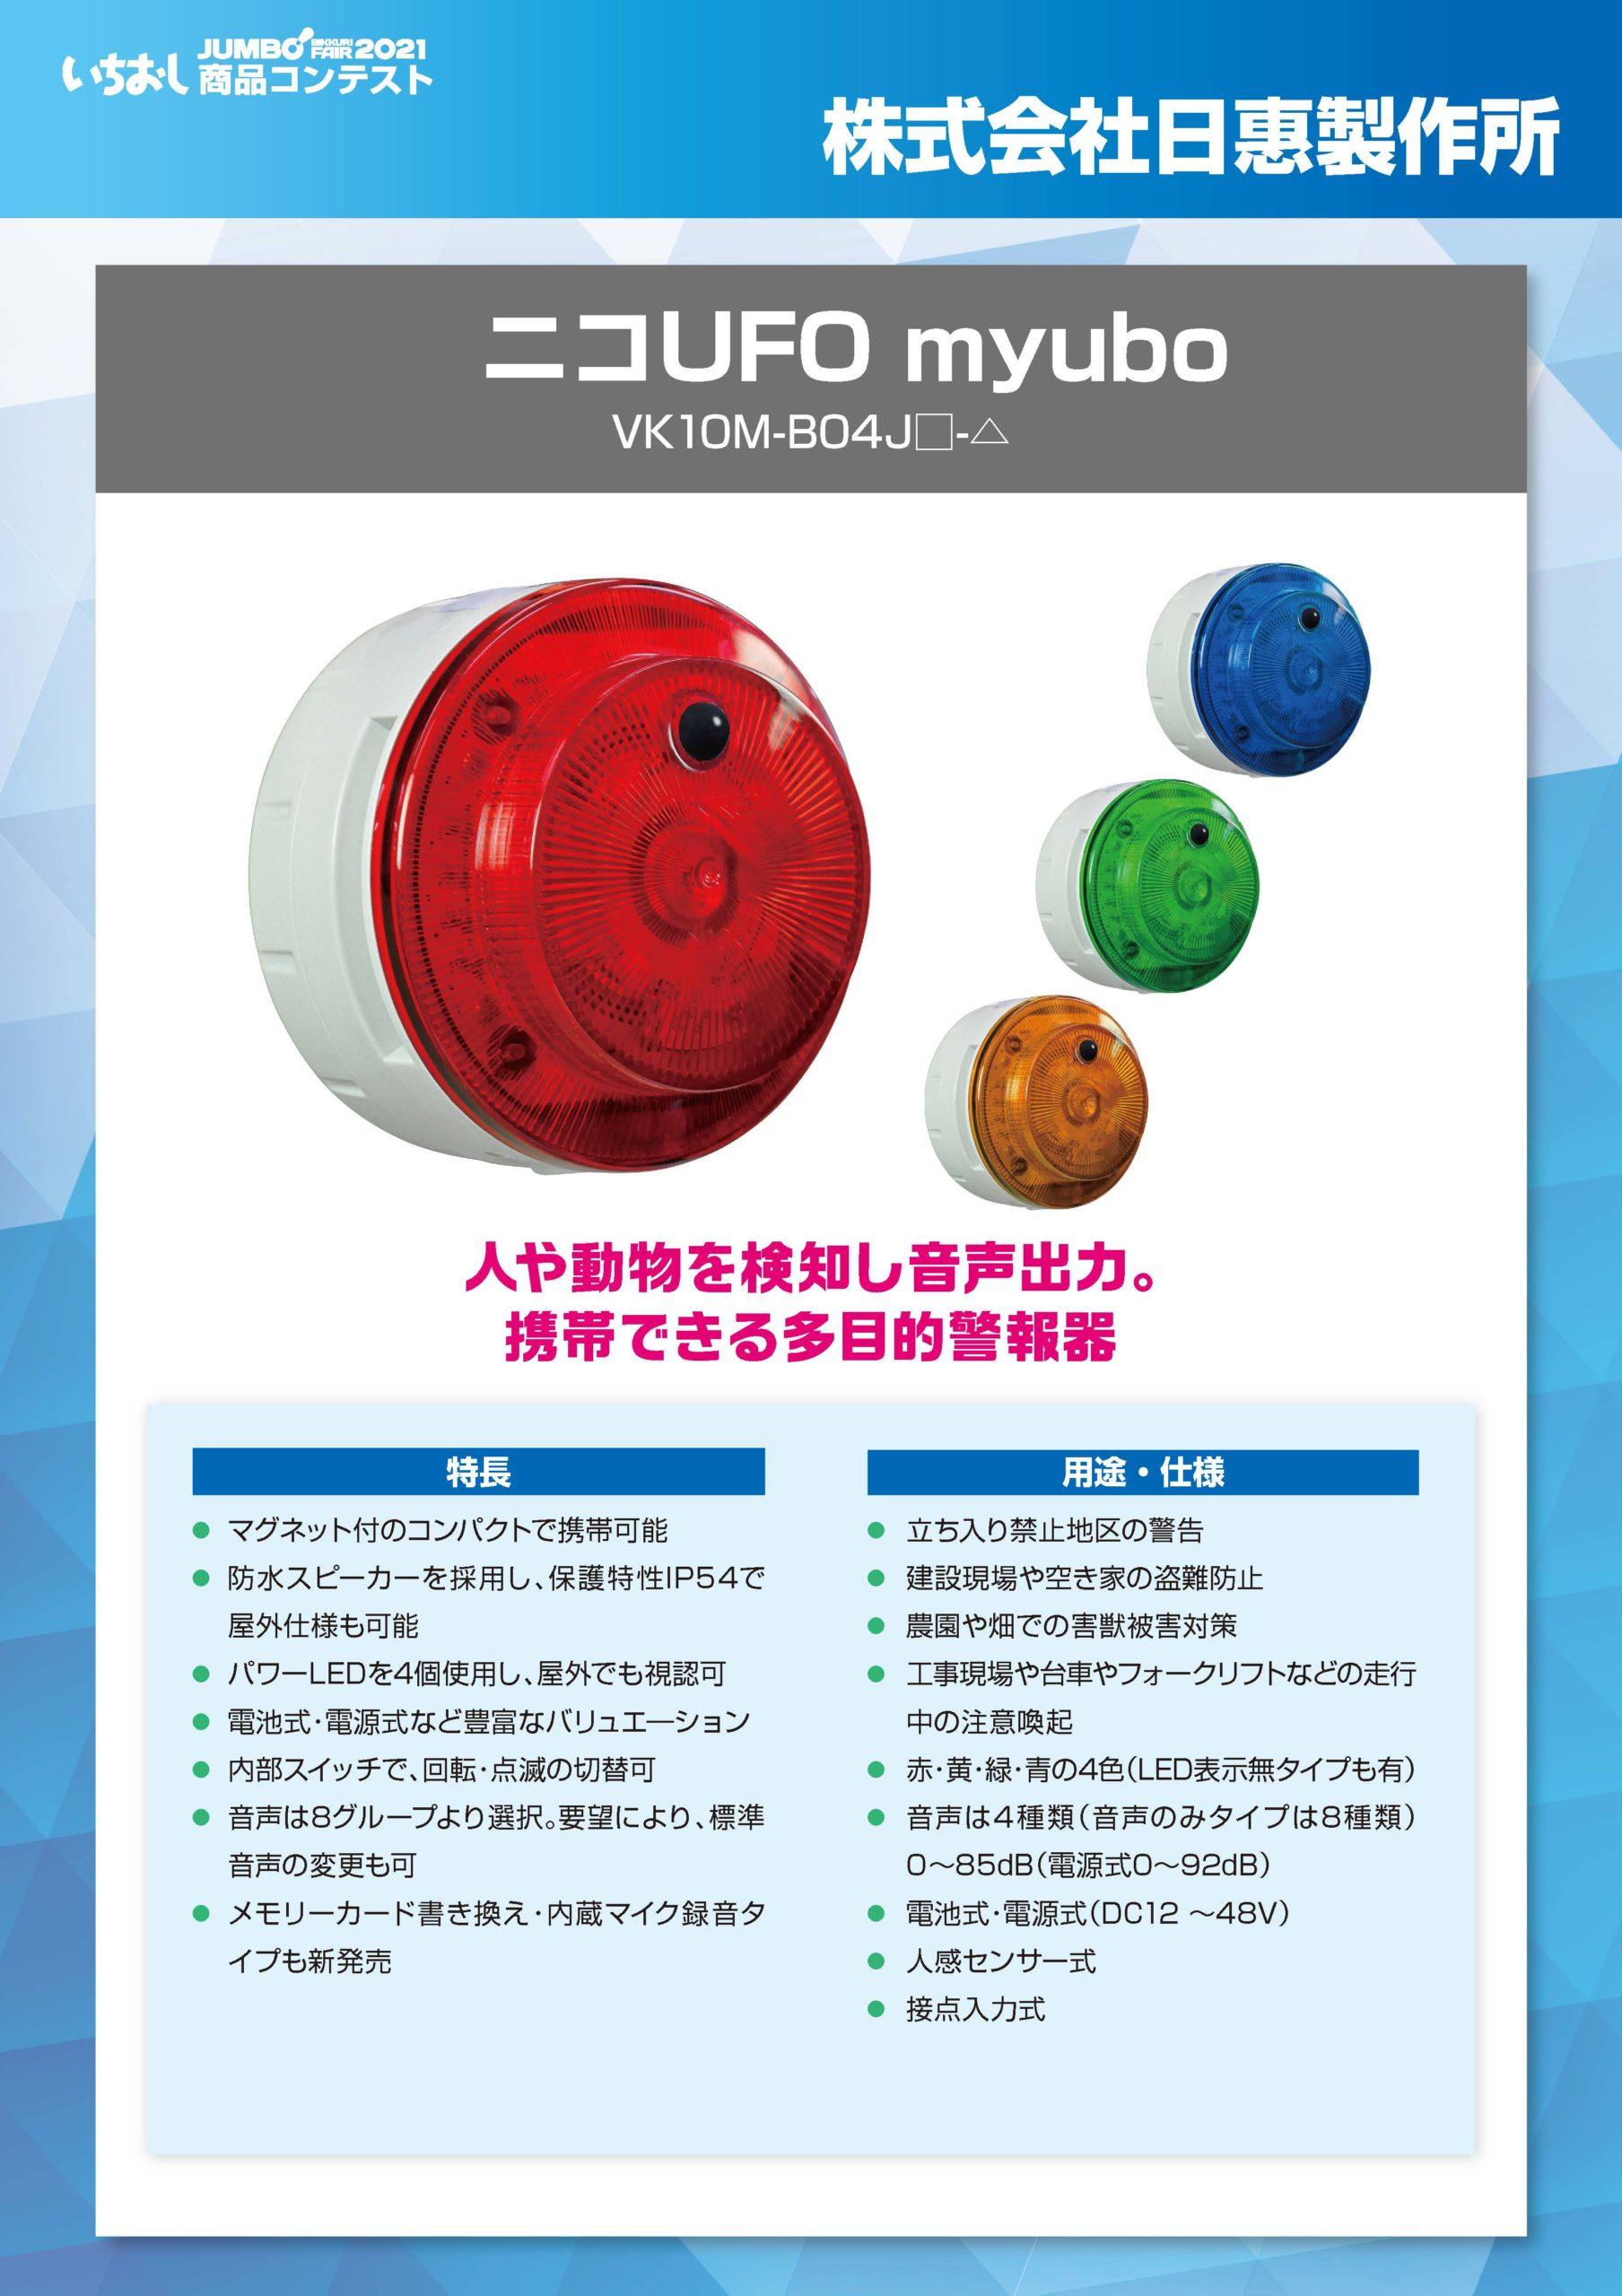 「ニコUFO myubo」株式会社日惠製作所の画像